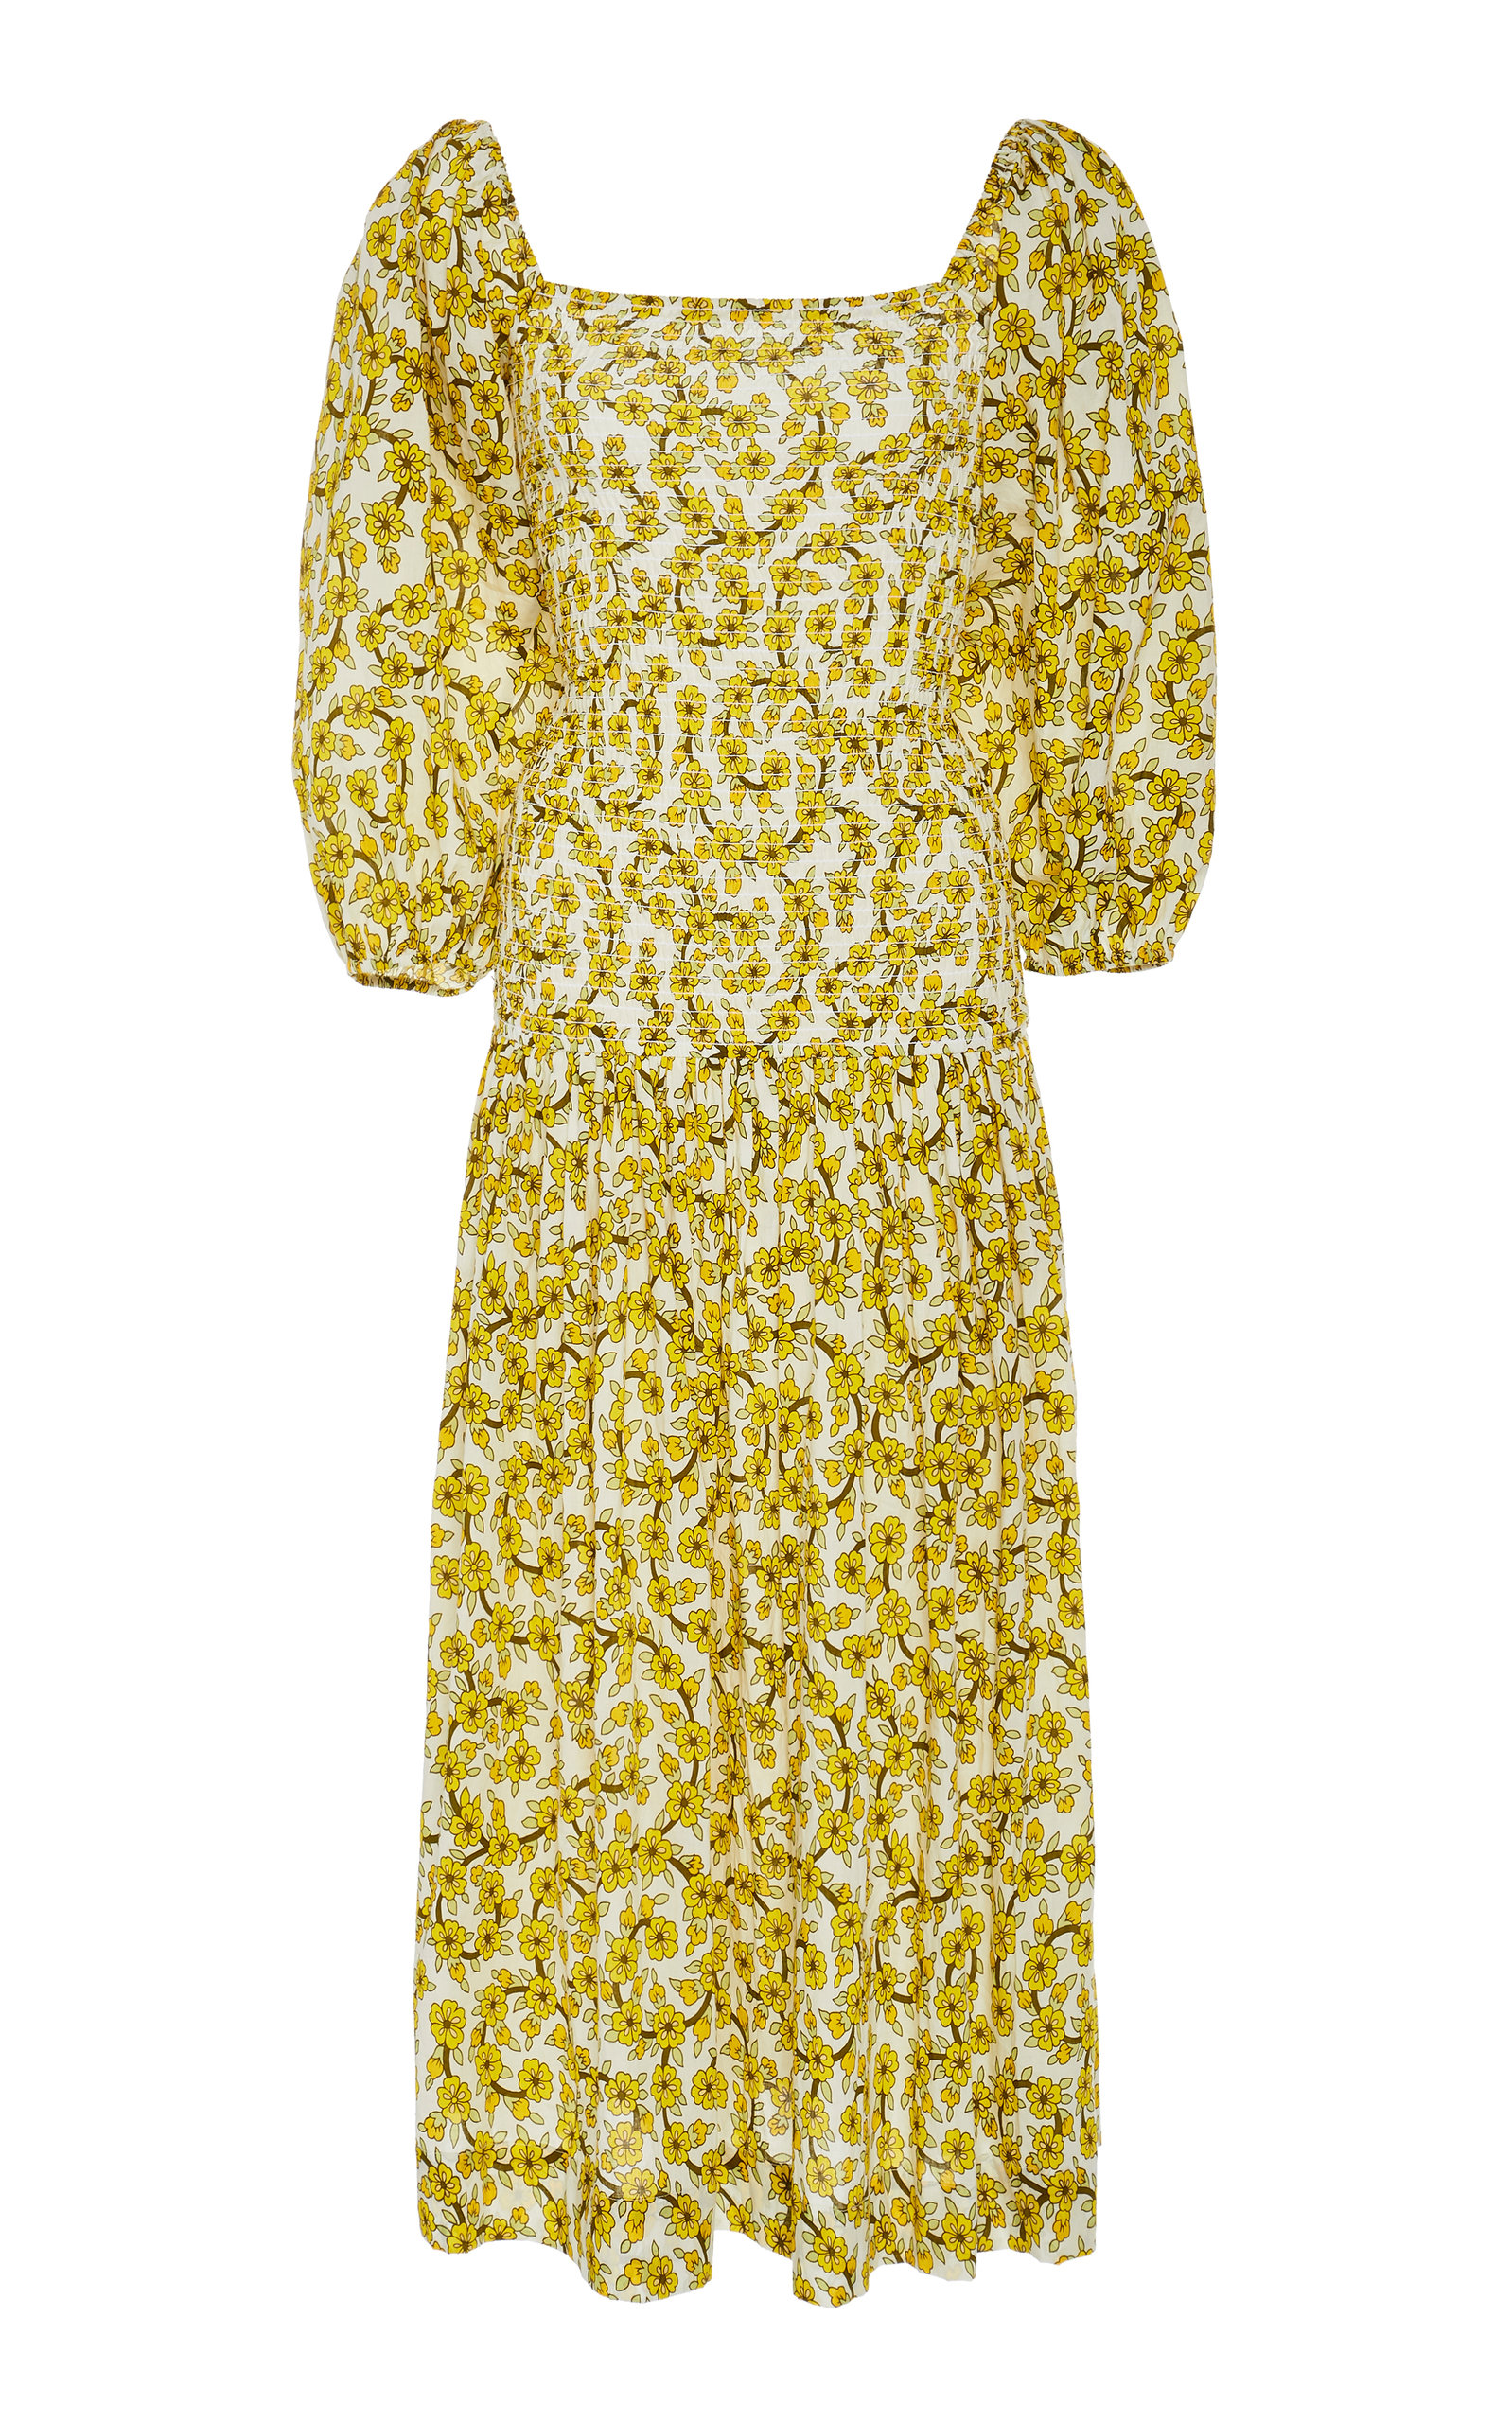 Harper Smocked Floral Print Cotton Midi Dress by Rhode